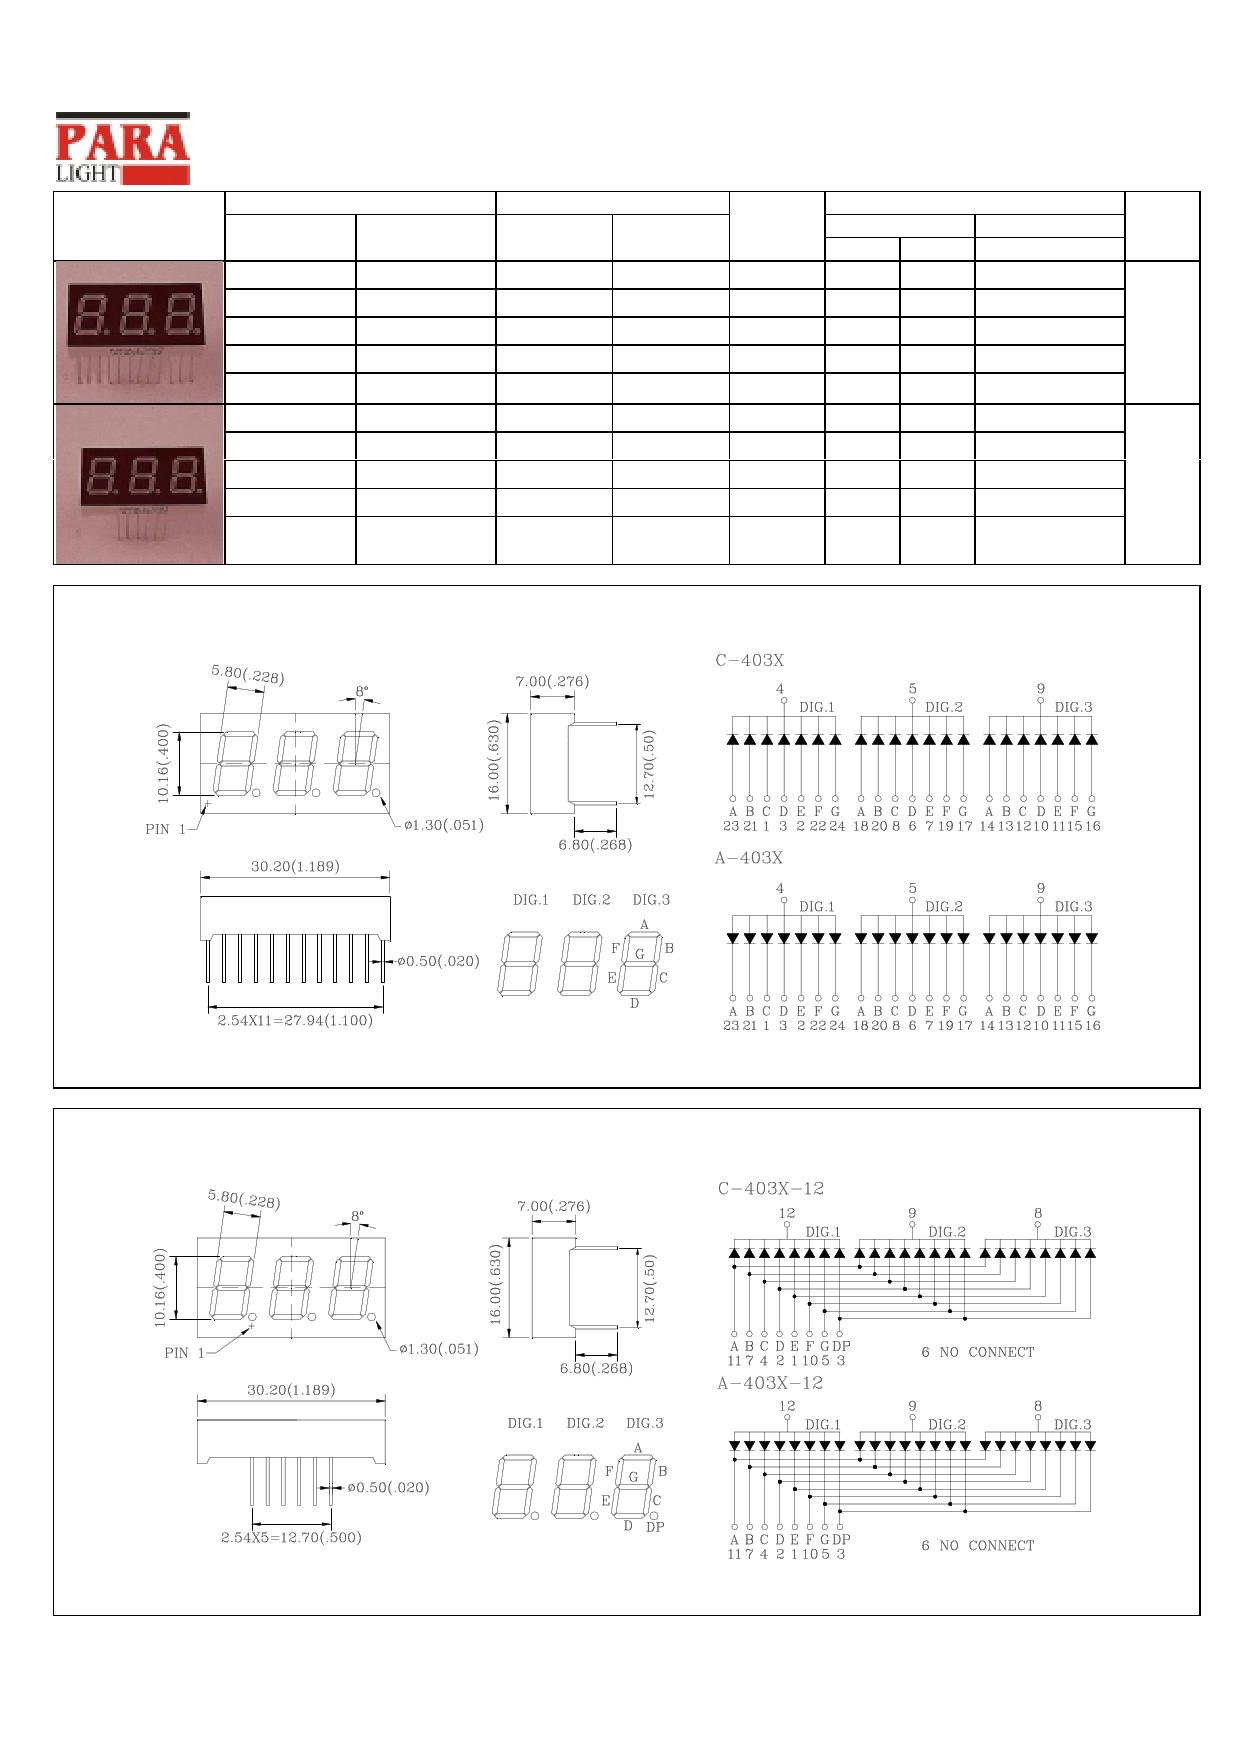 C-403G-12 دیتاشیت PDF